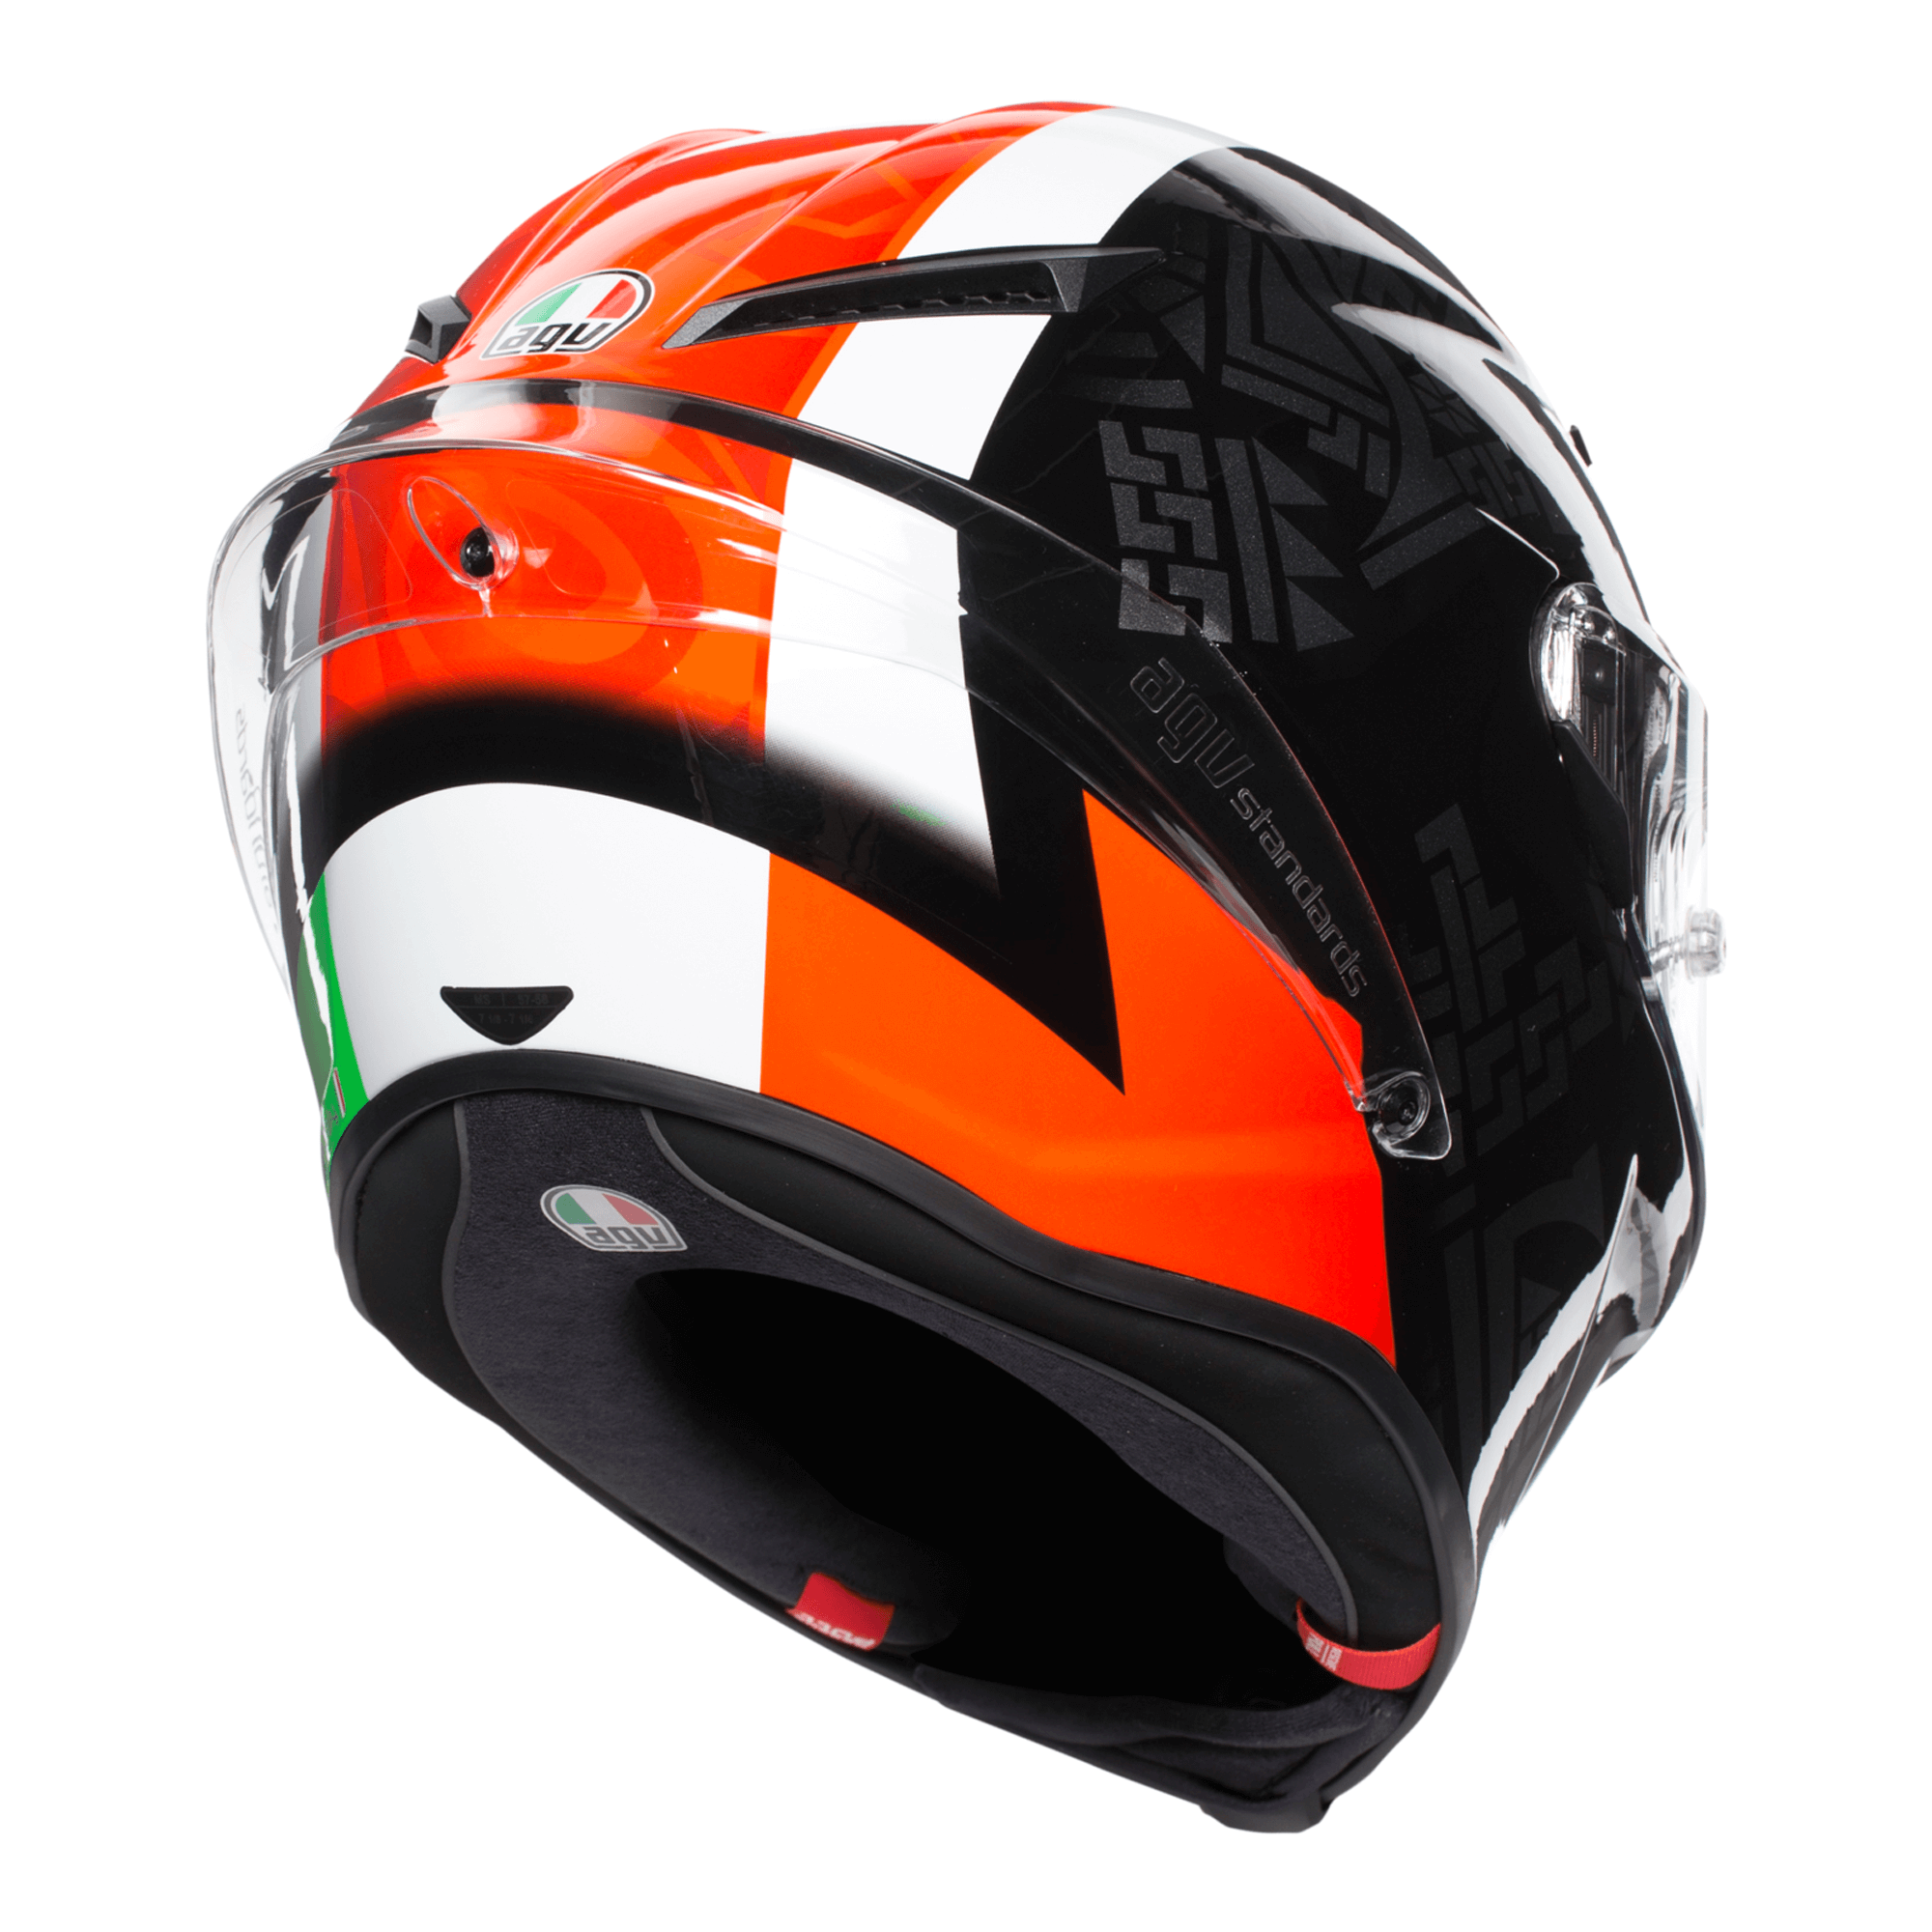 AGV K1 Pit Lane   AGV K1   AGV helmets